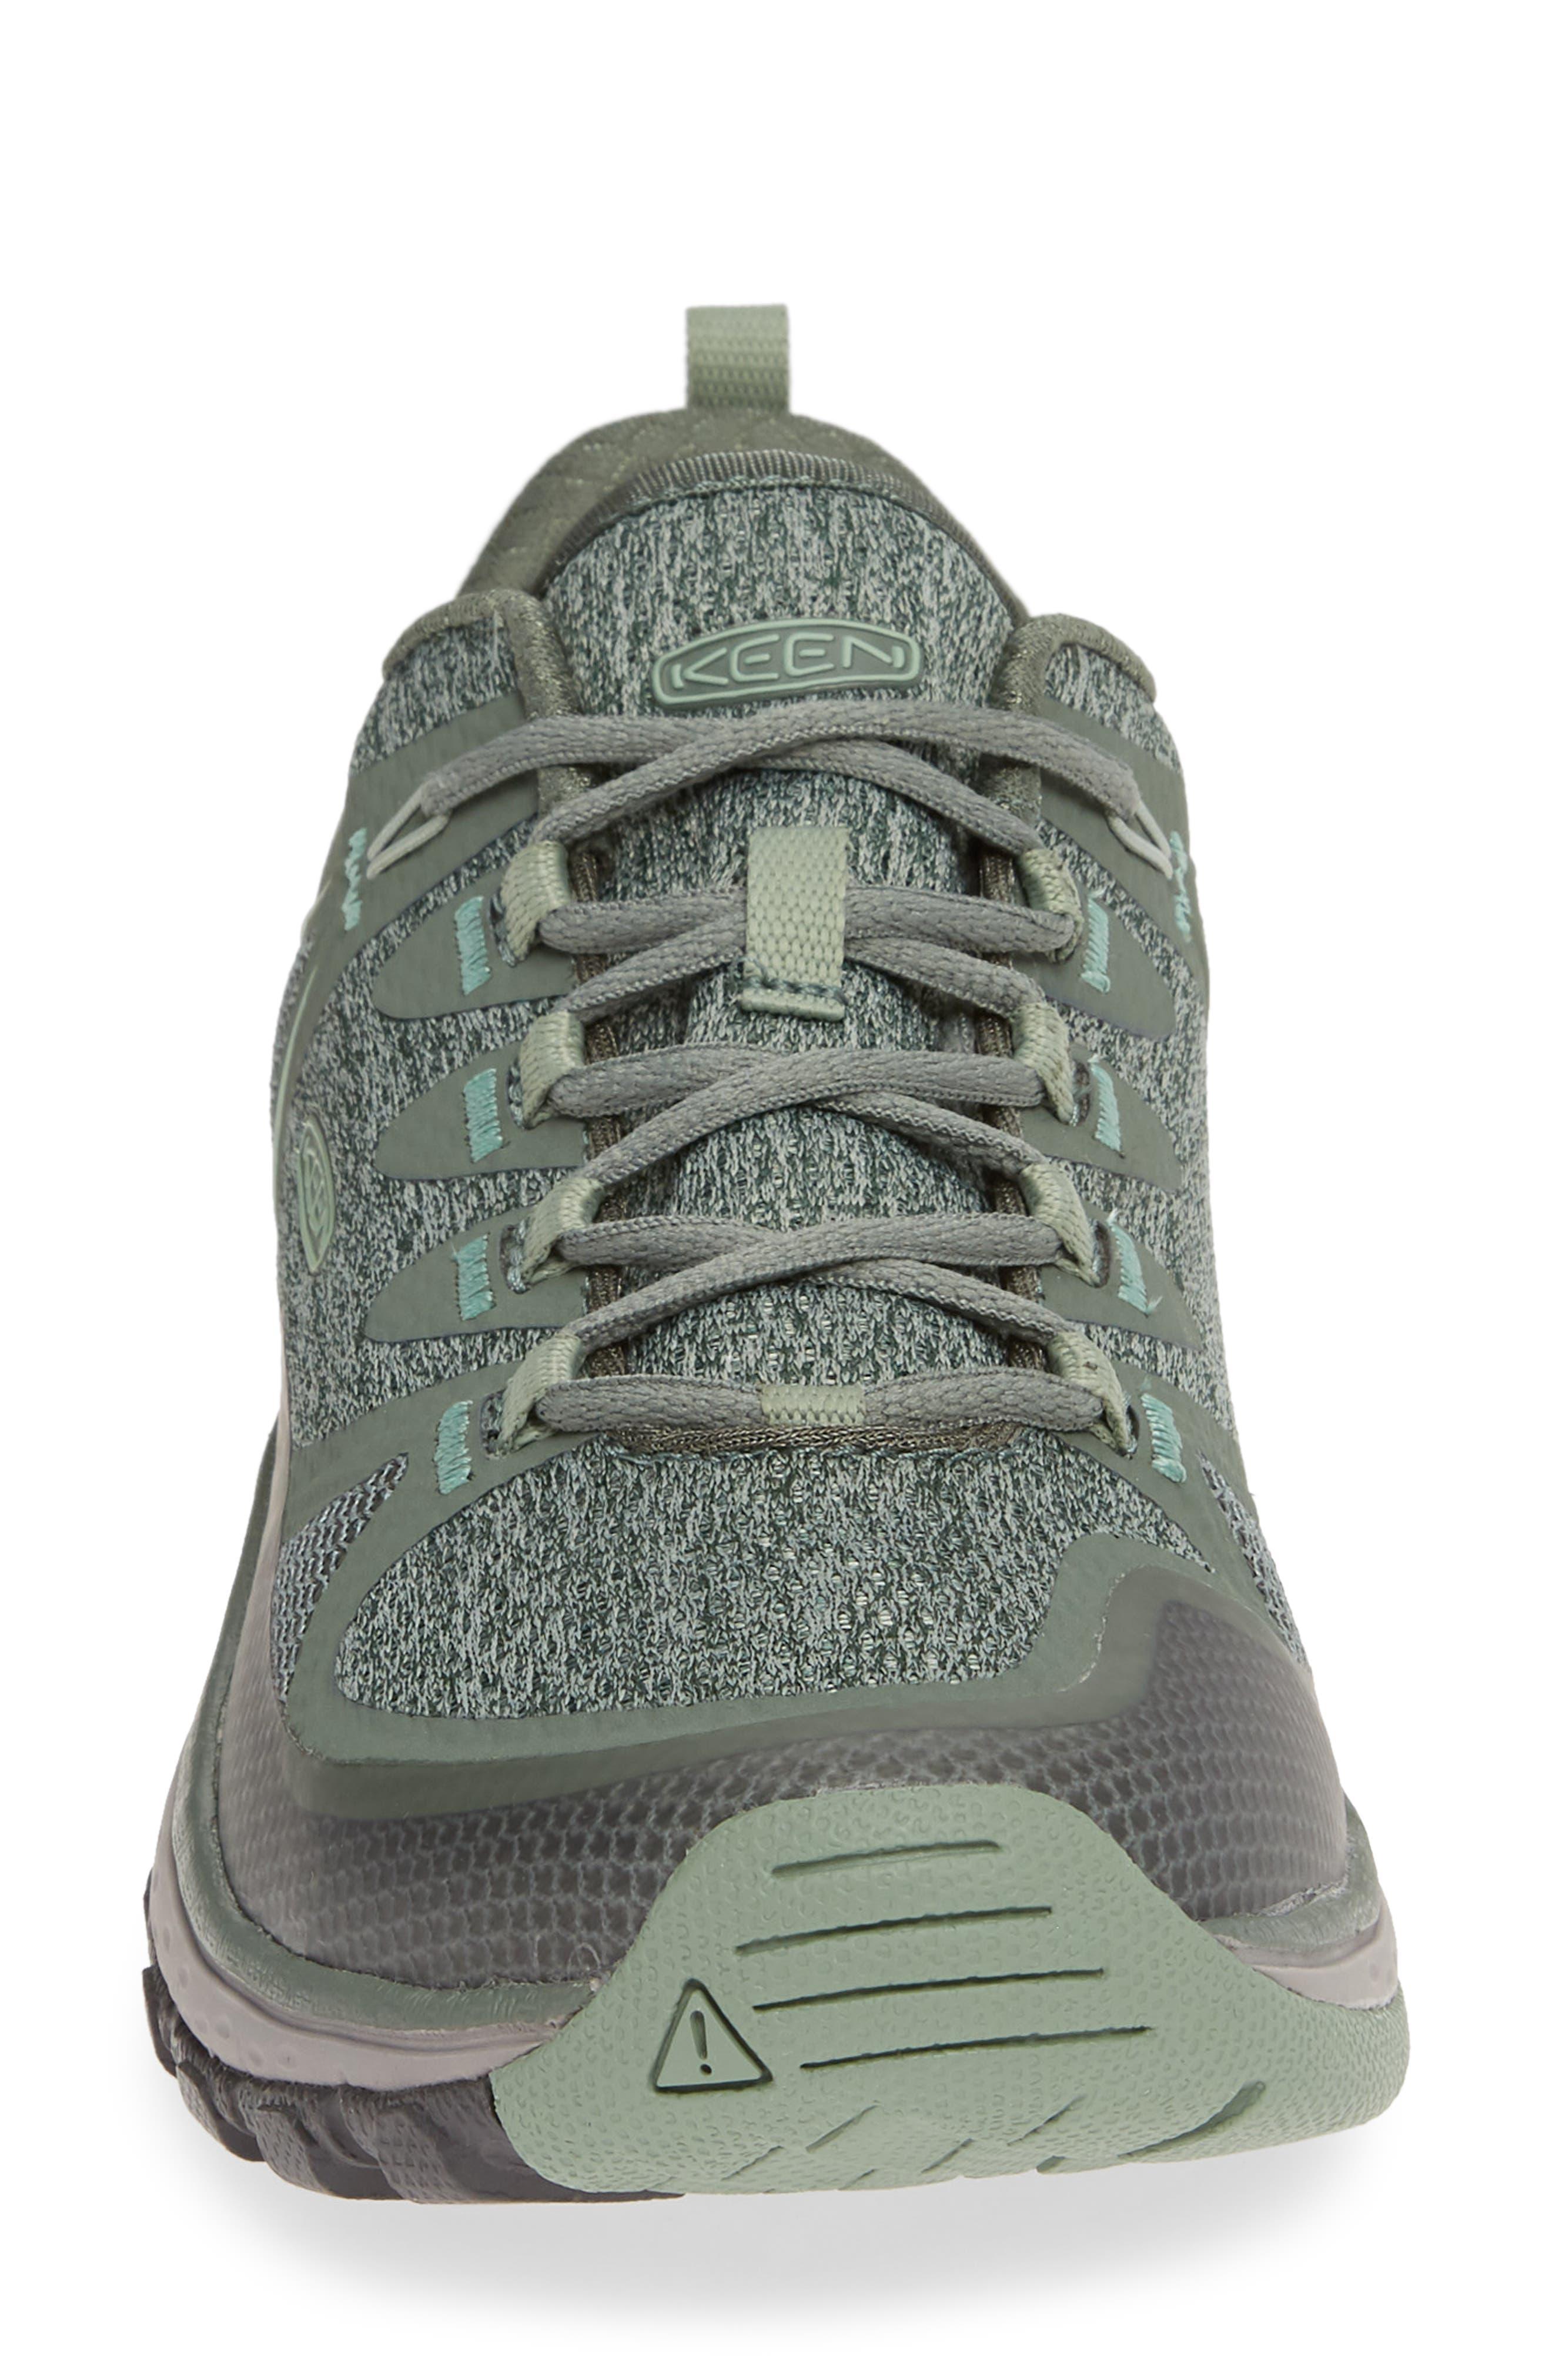 KEEN, Terradora Vent Hiking Shoe, Alternate thumbnail 4, color, LAUREL WREATH/ LILY PAD FABRIC